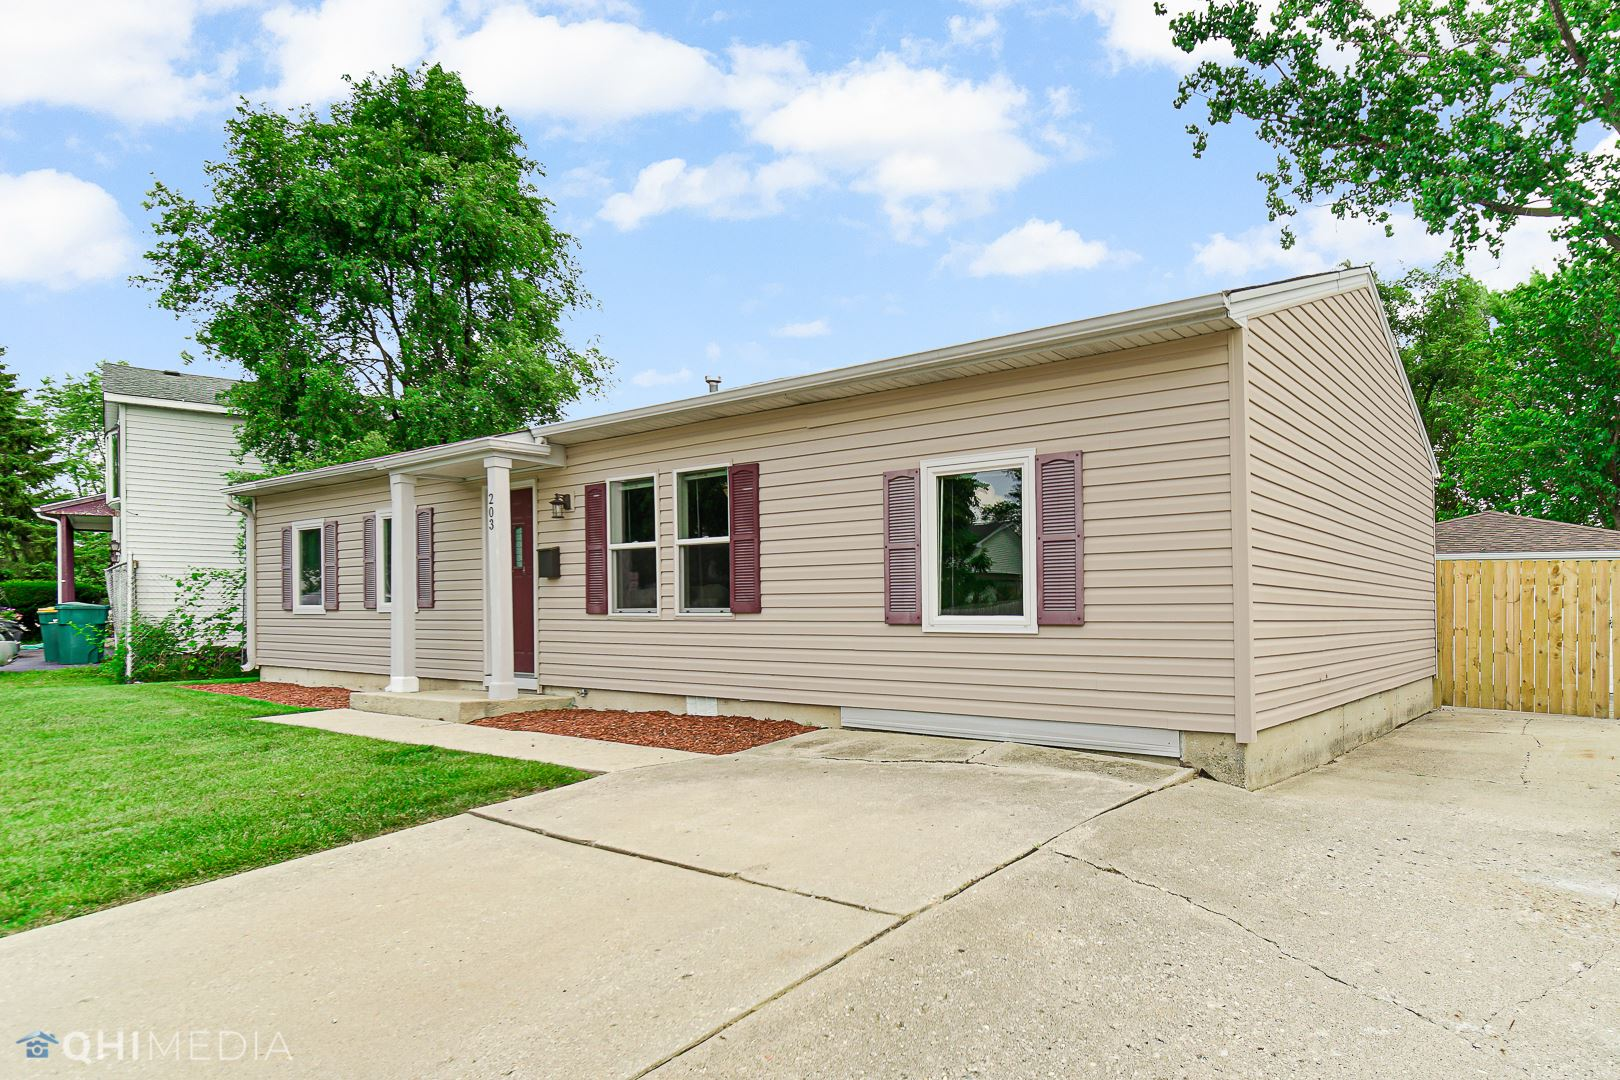 Photo of 203 Troxel Avenue, Romeoville, IL 60446 (MLS # 11149838)